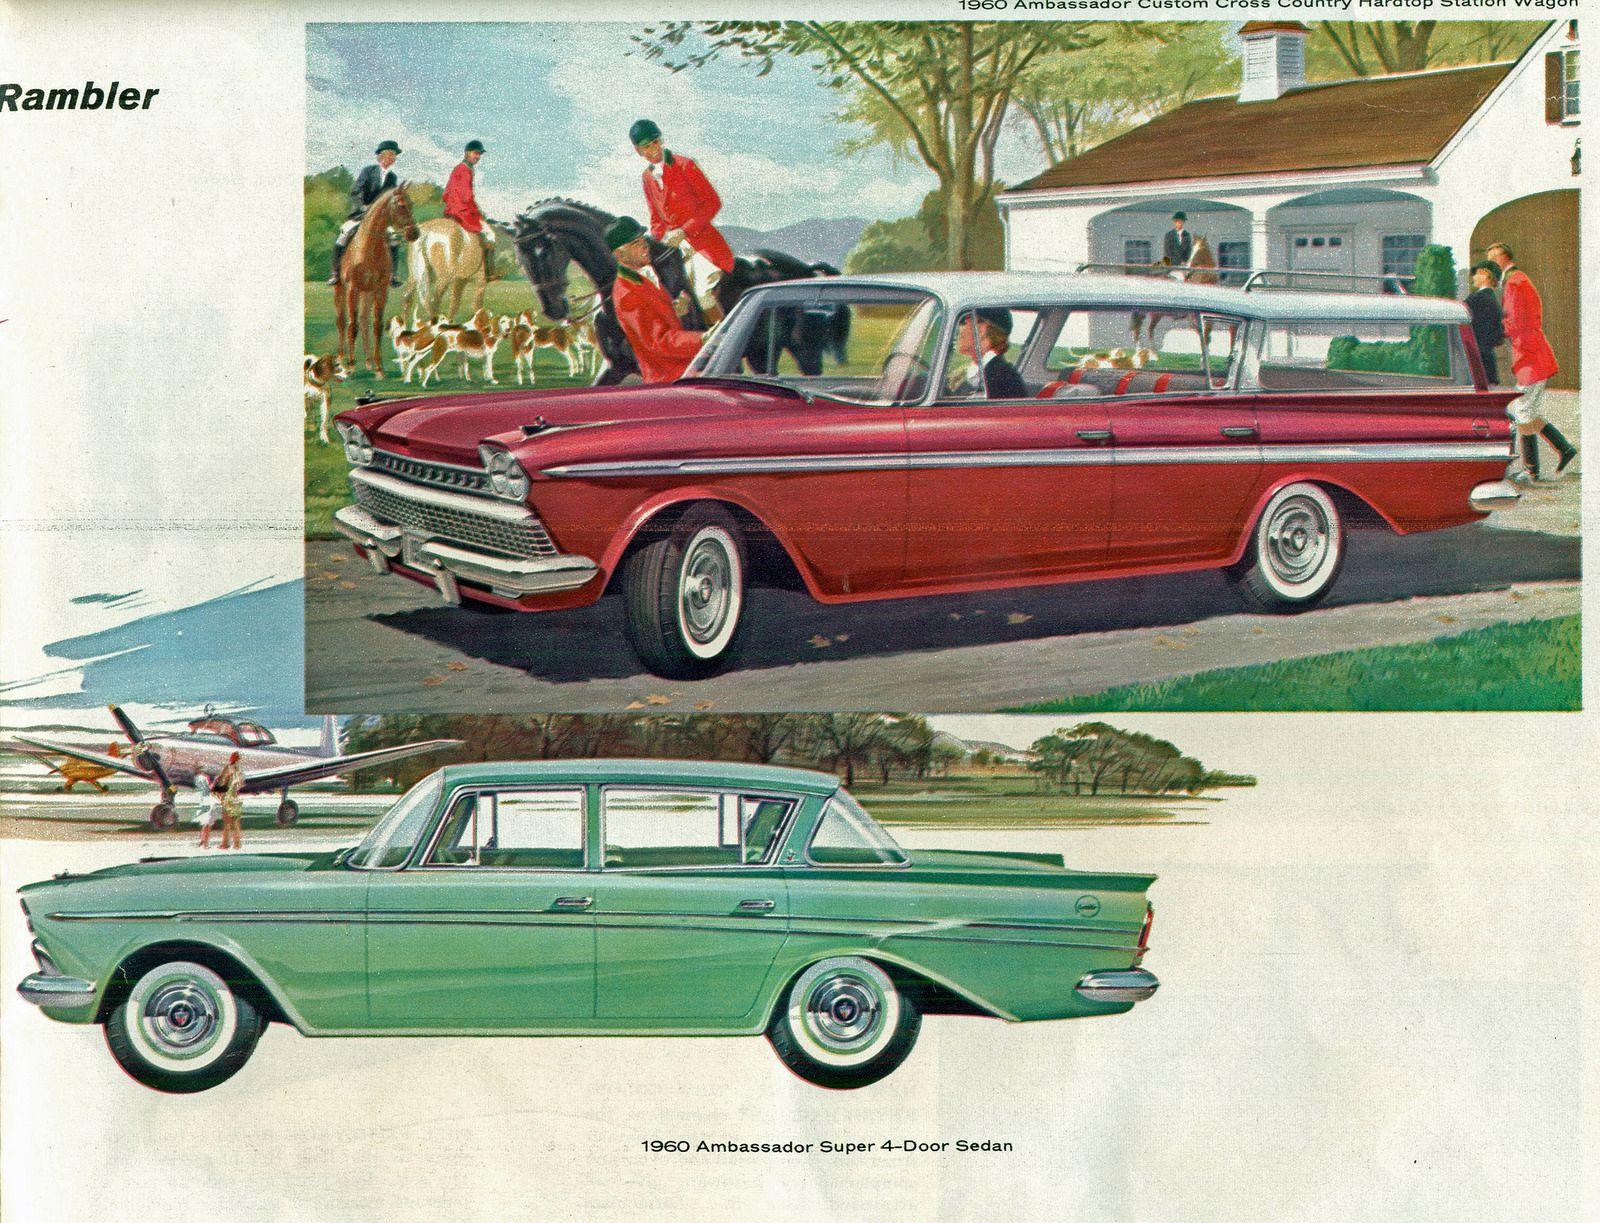 1960 American Motors Rambler Ambassador Cross Country 4 Door Hardtop Station Wagon and Ambassador Super 4 Door Sedan | by coconv